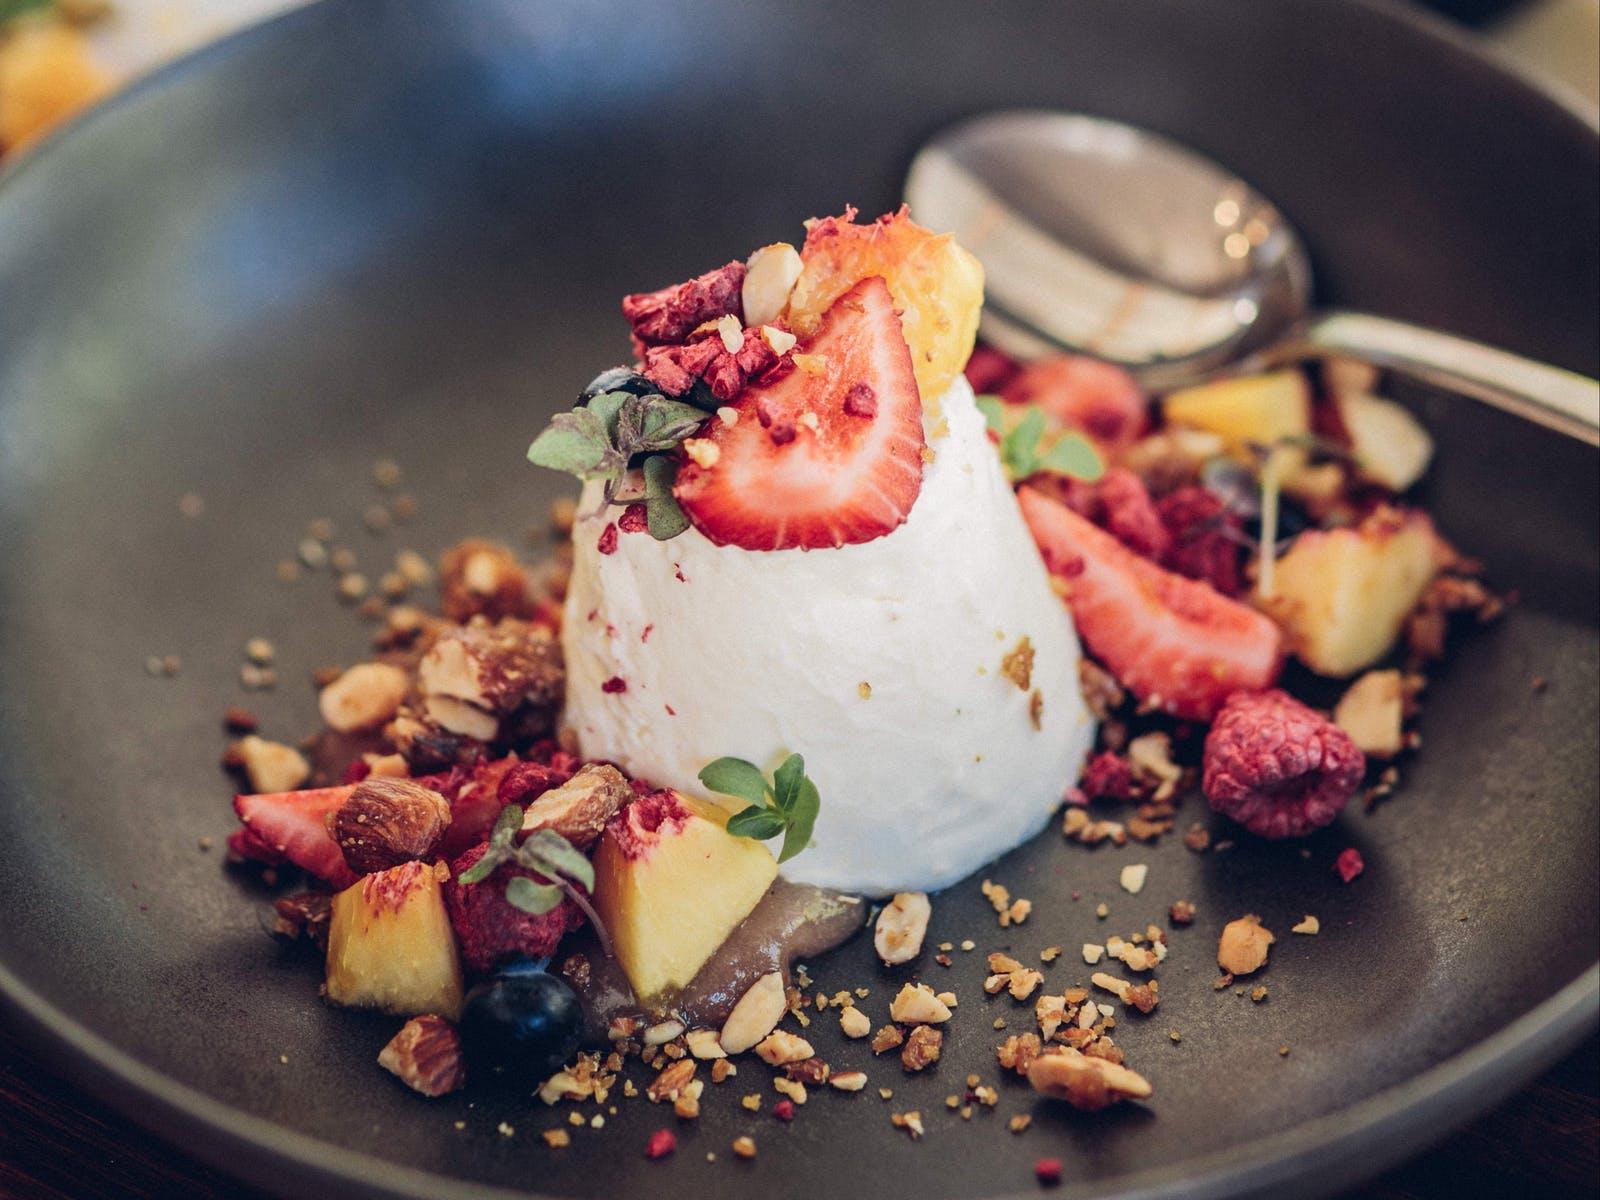 Fruit and yoghurt